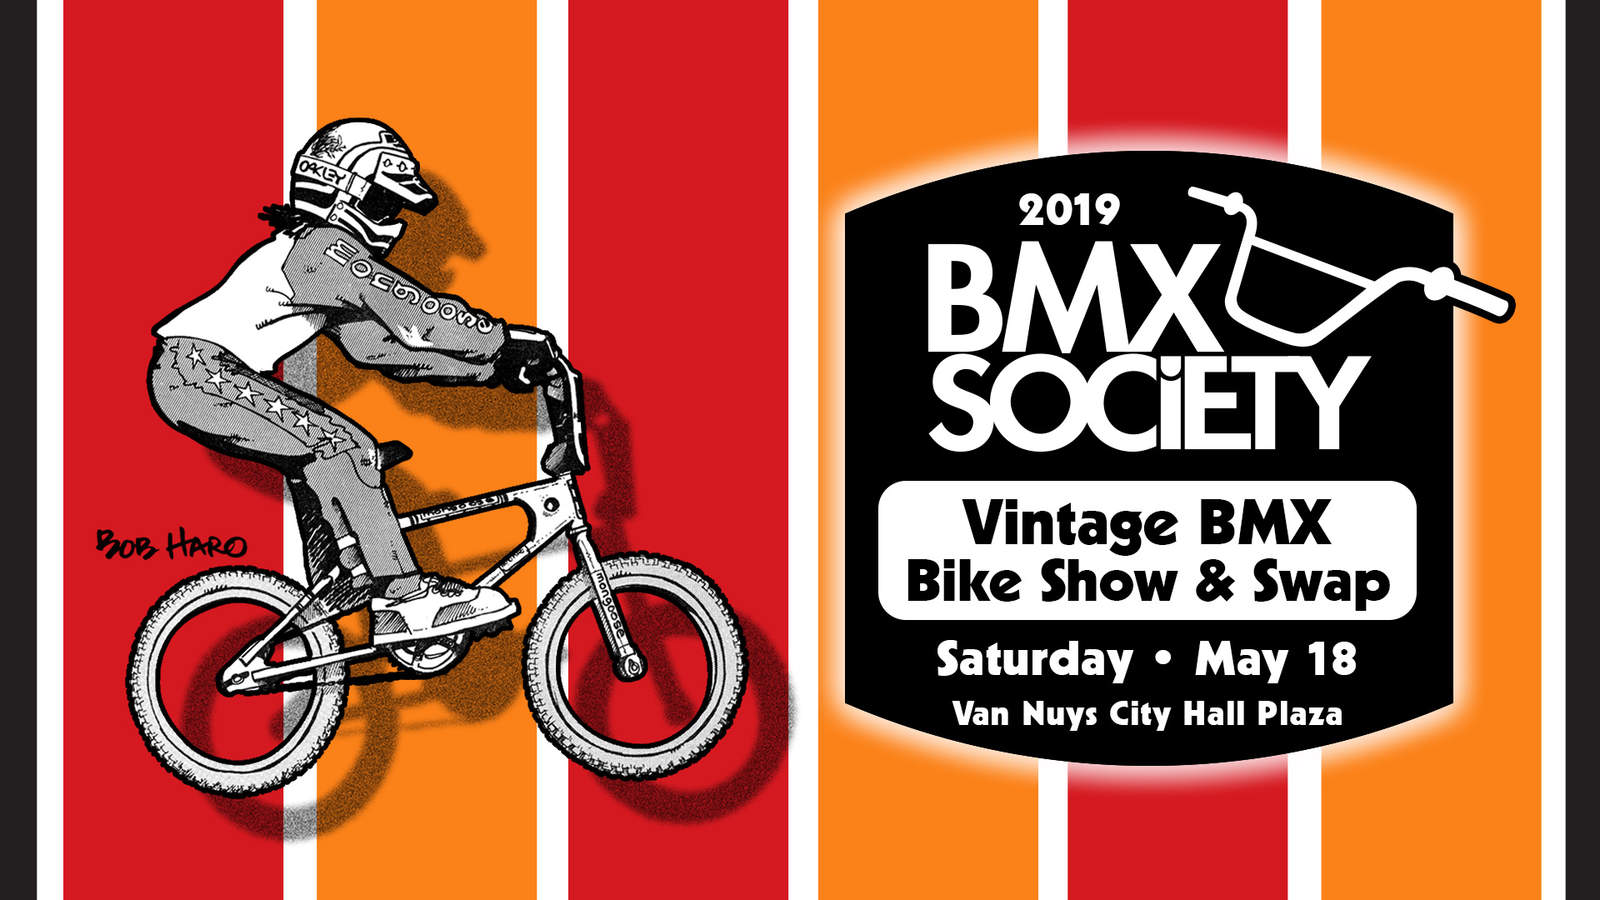 bmxsociety-show-banner_20195c9142c12d.jp